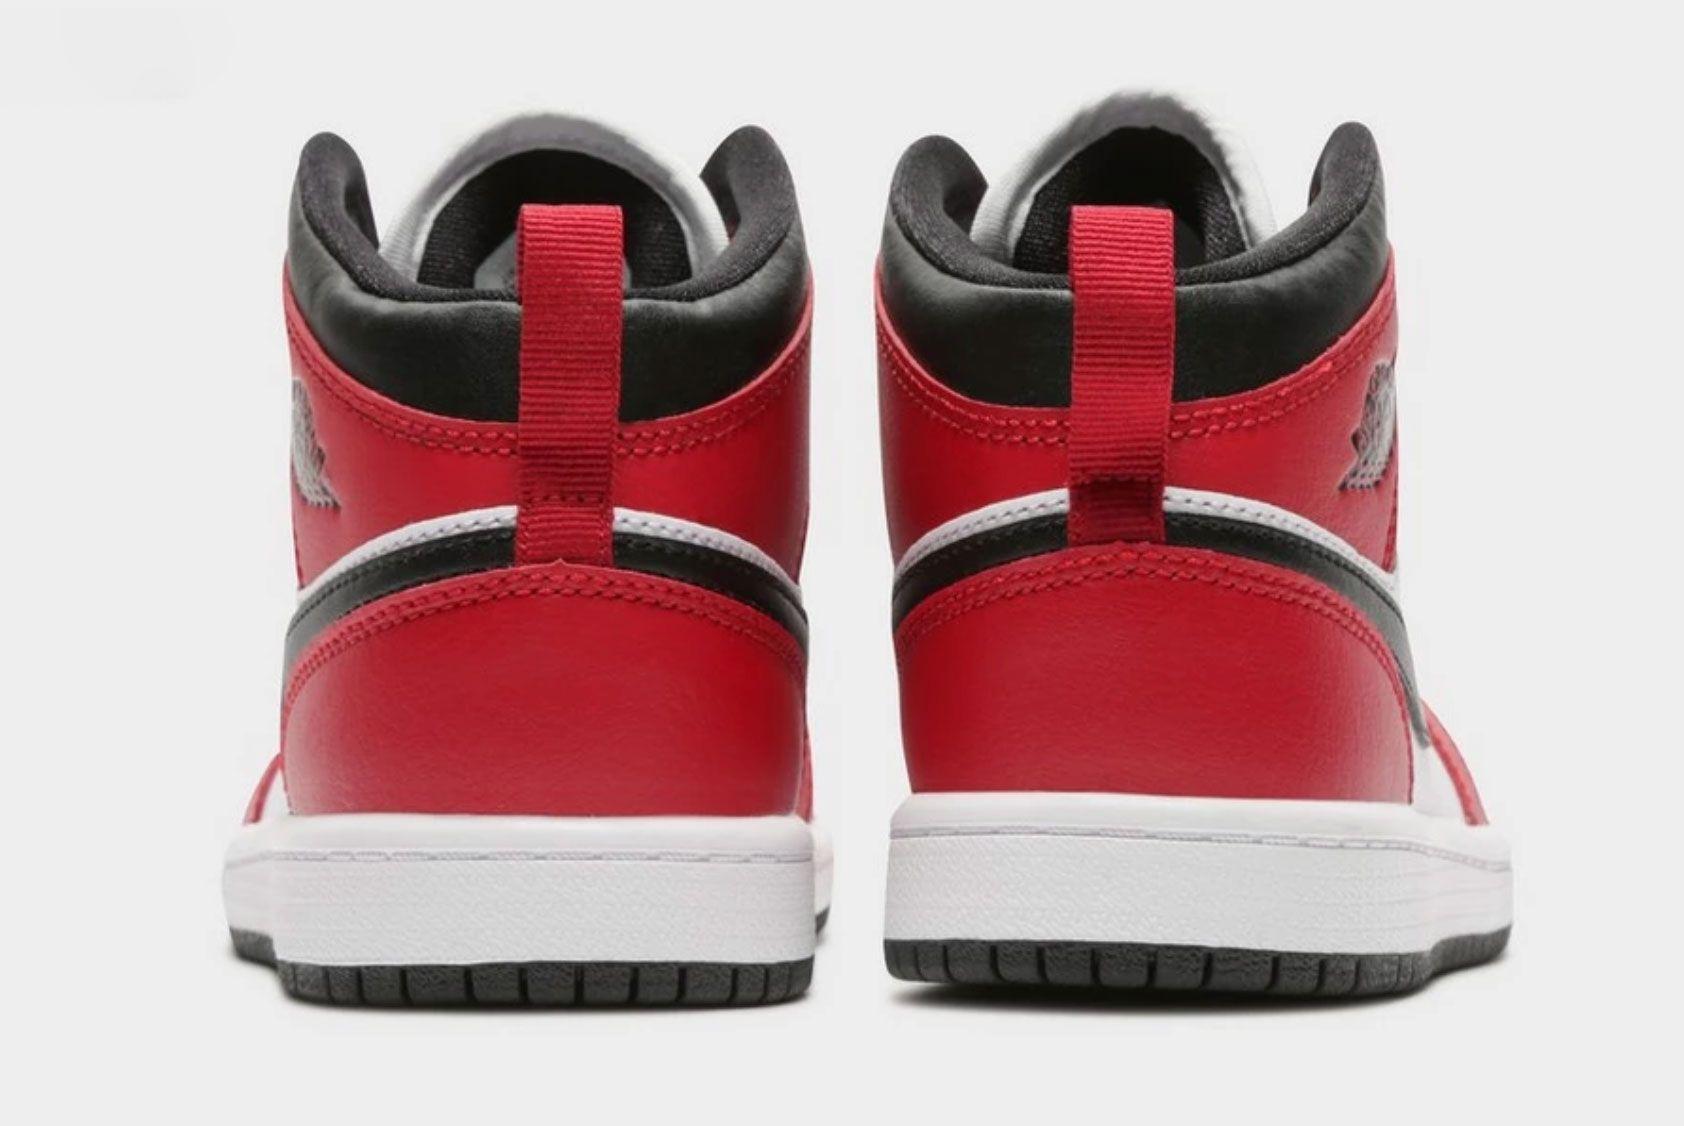 Air Jordan 1 Mid PS (Chicago)